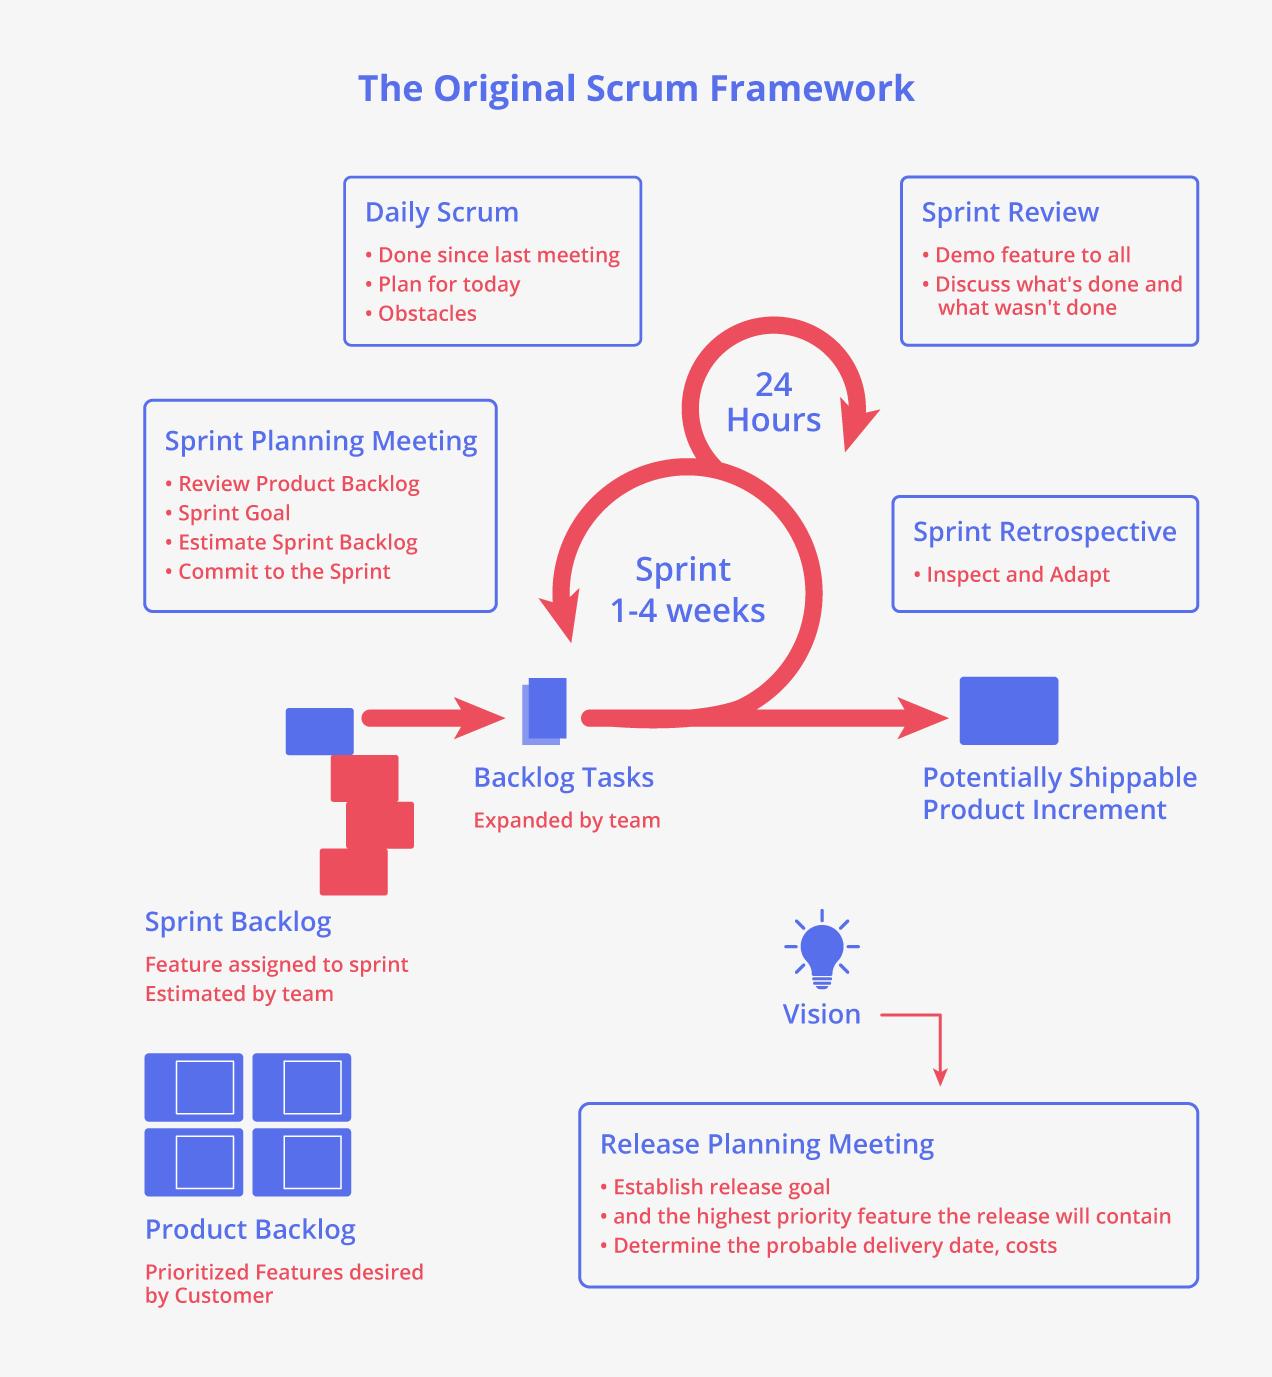 The Original Scrum Framework